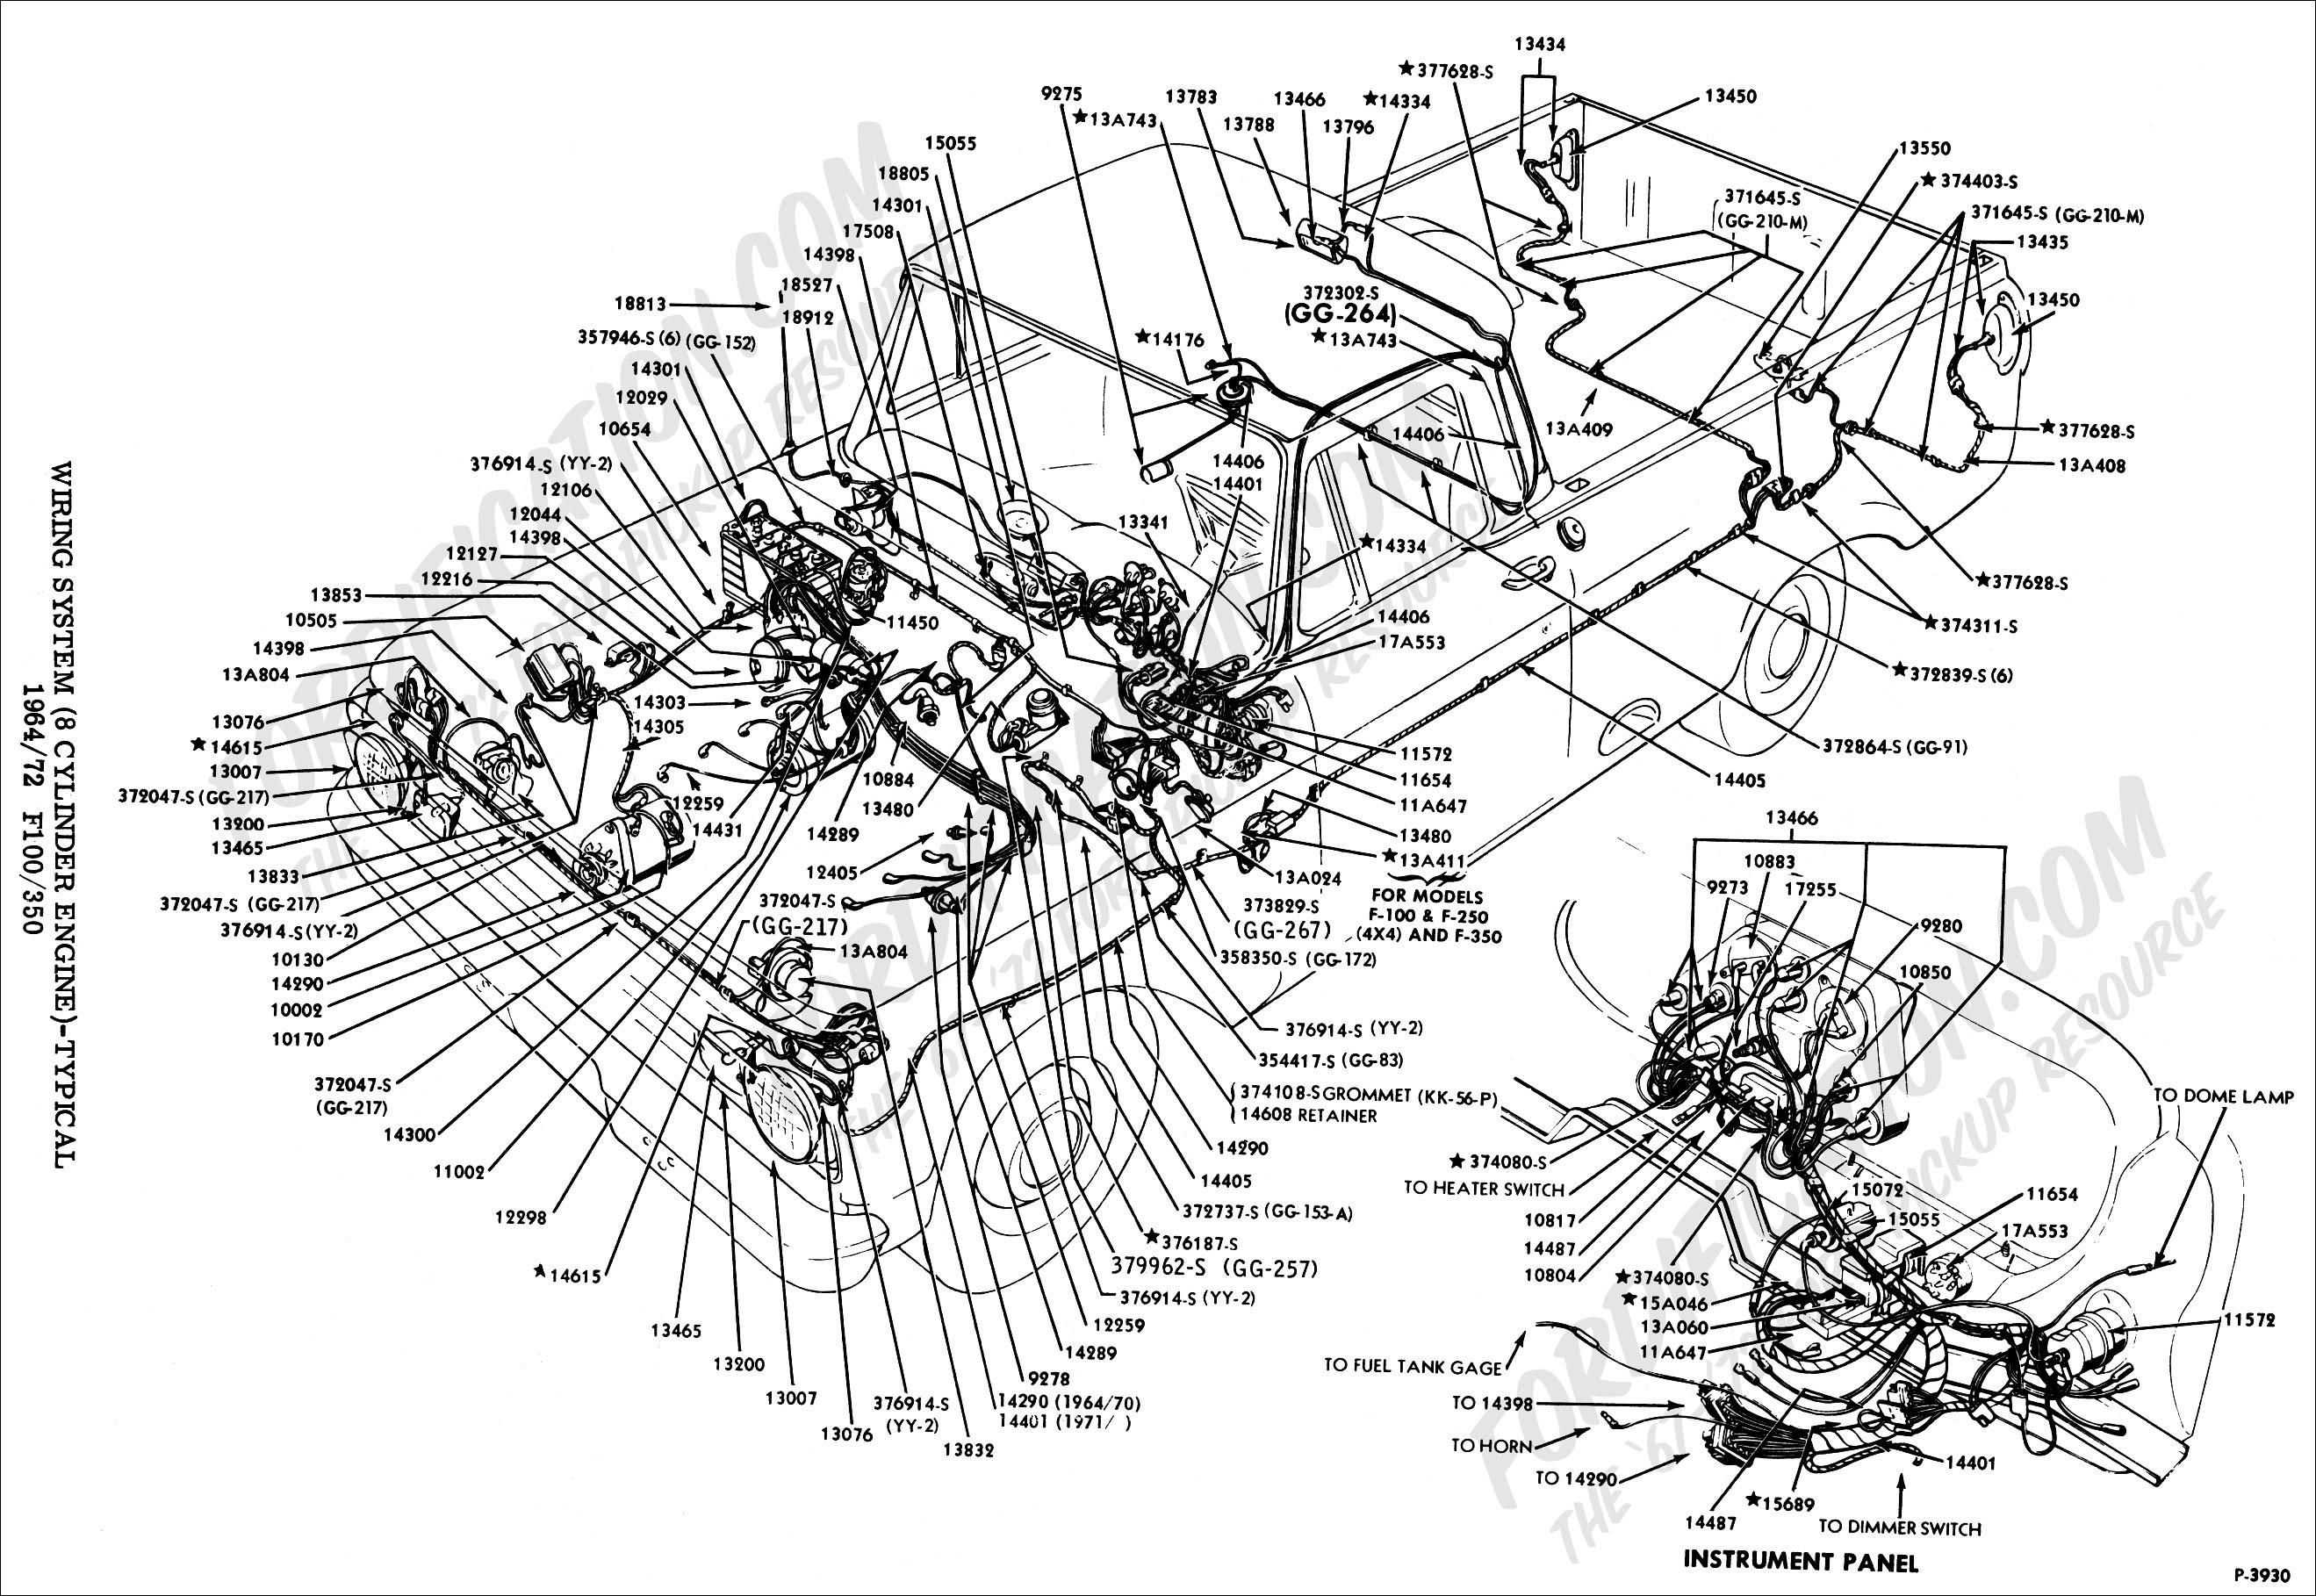 Fabulous Ford Pickup Wiring Diagrams Basic Electronics Wiring Diagram Wiring Cloud Licukshollocom